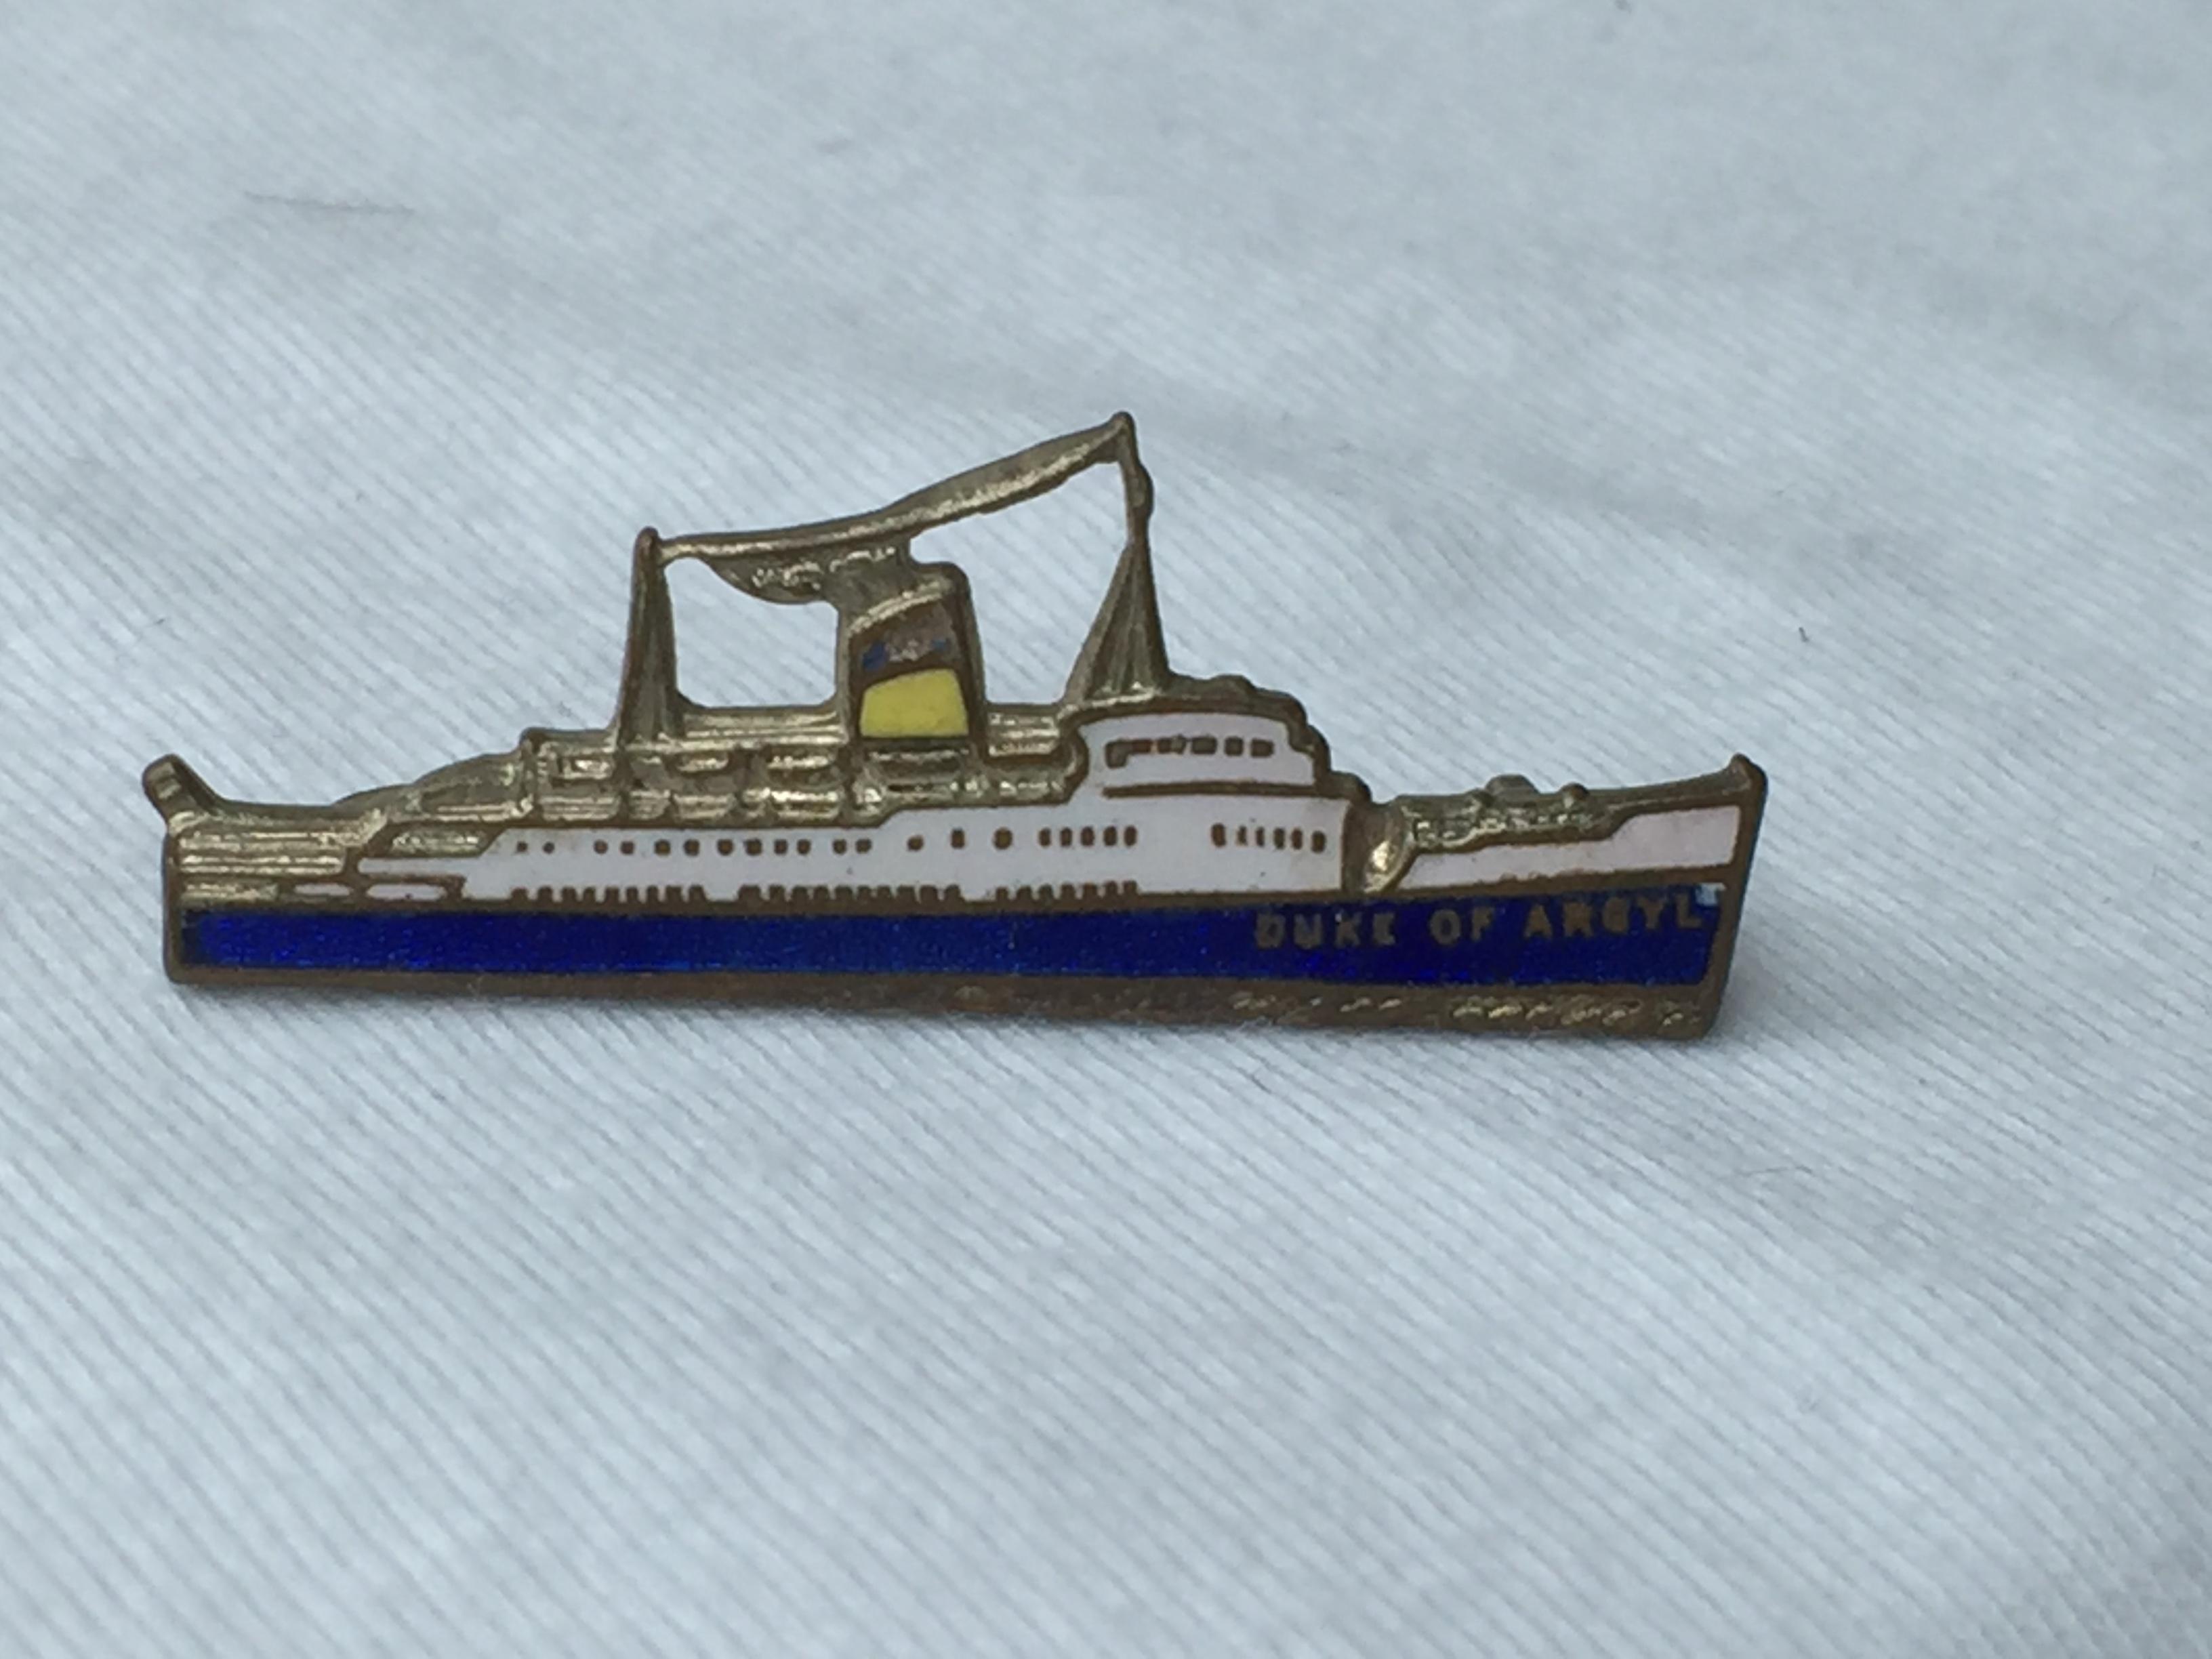 SHIP SHAPE LAPEL PIN FROM THE HEYSHAM-BELFAST FERRY CROSSING VESSEL THE DUKE OF ARGYLL